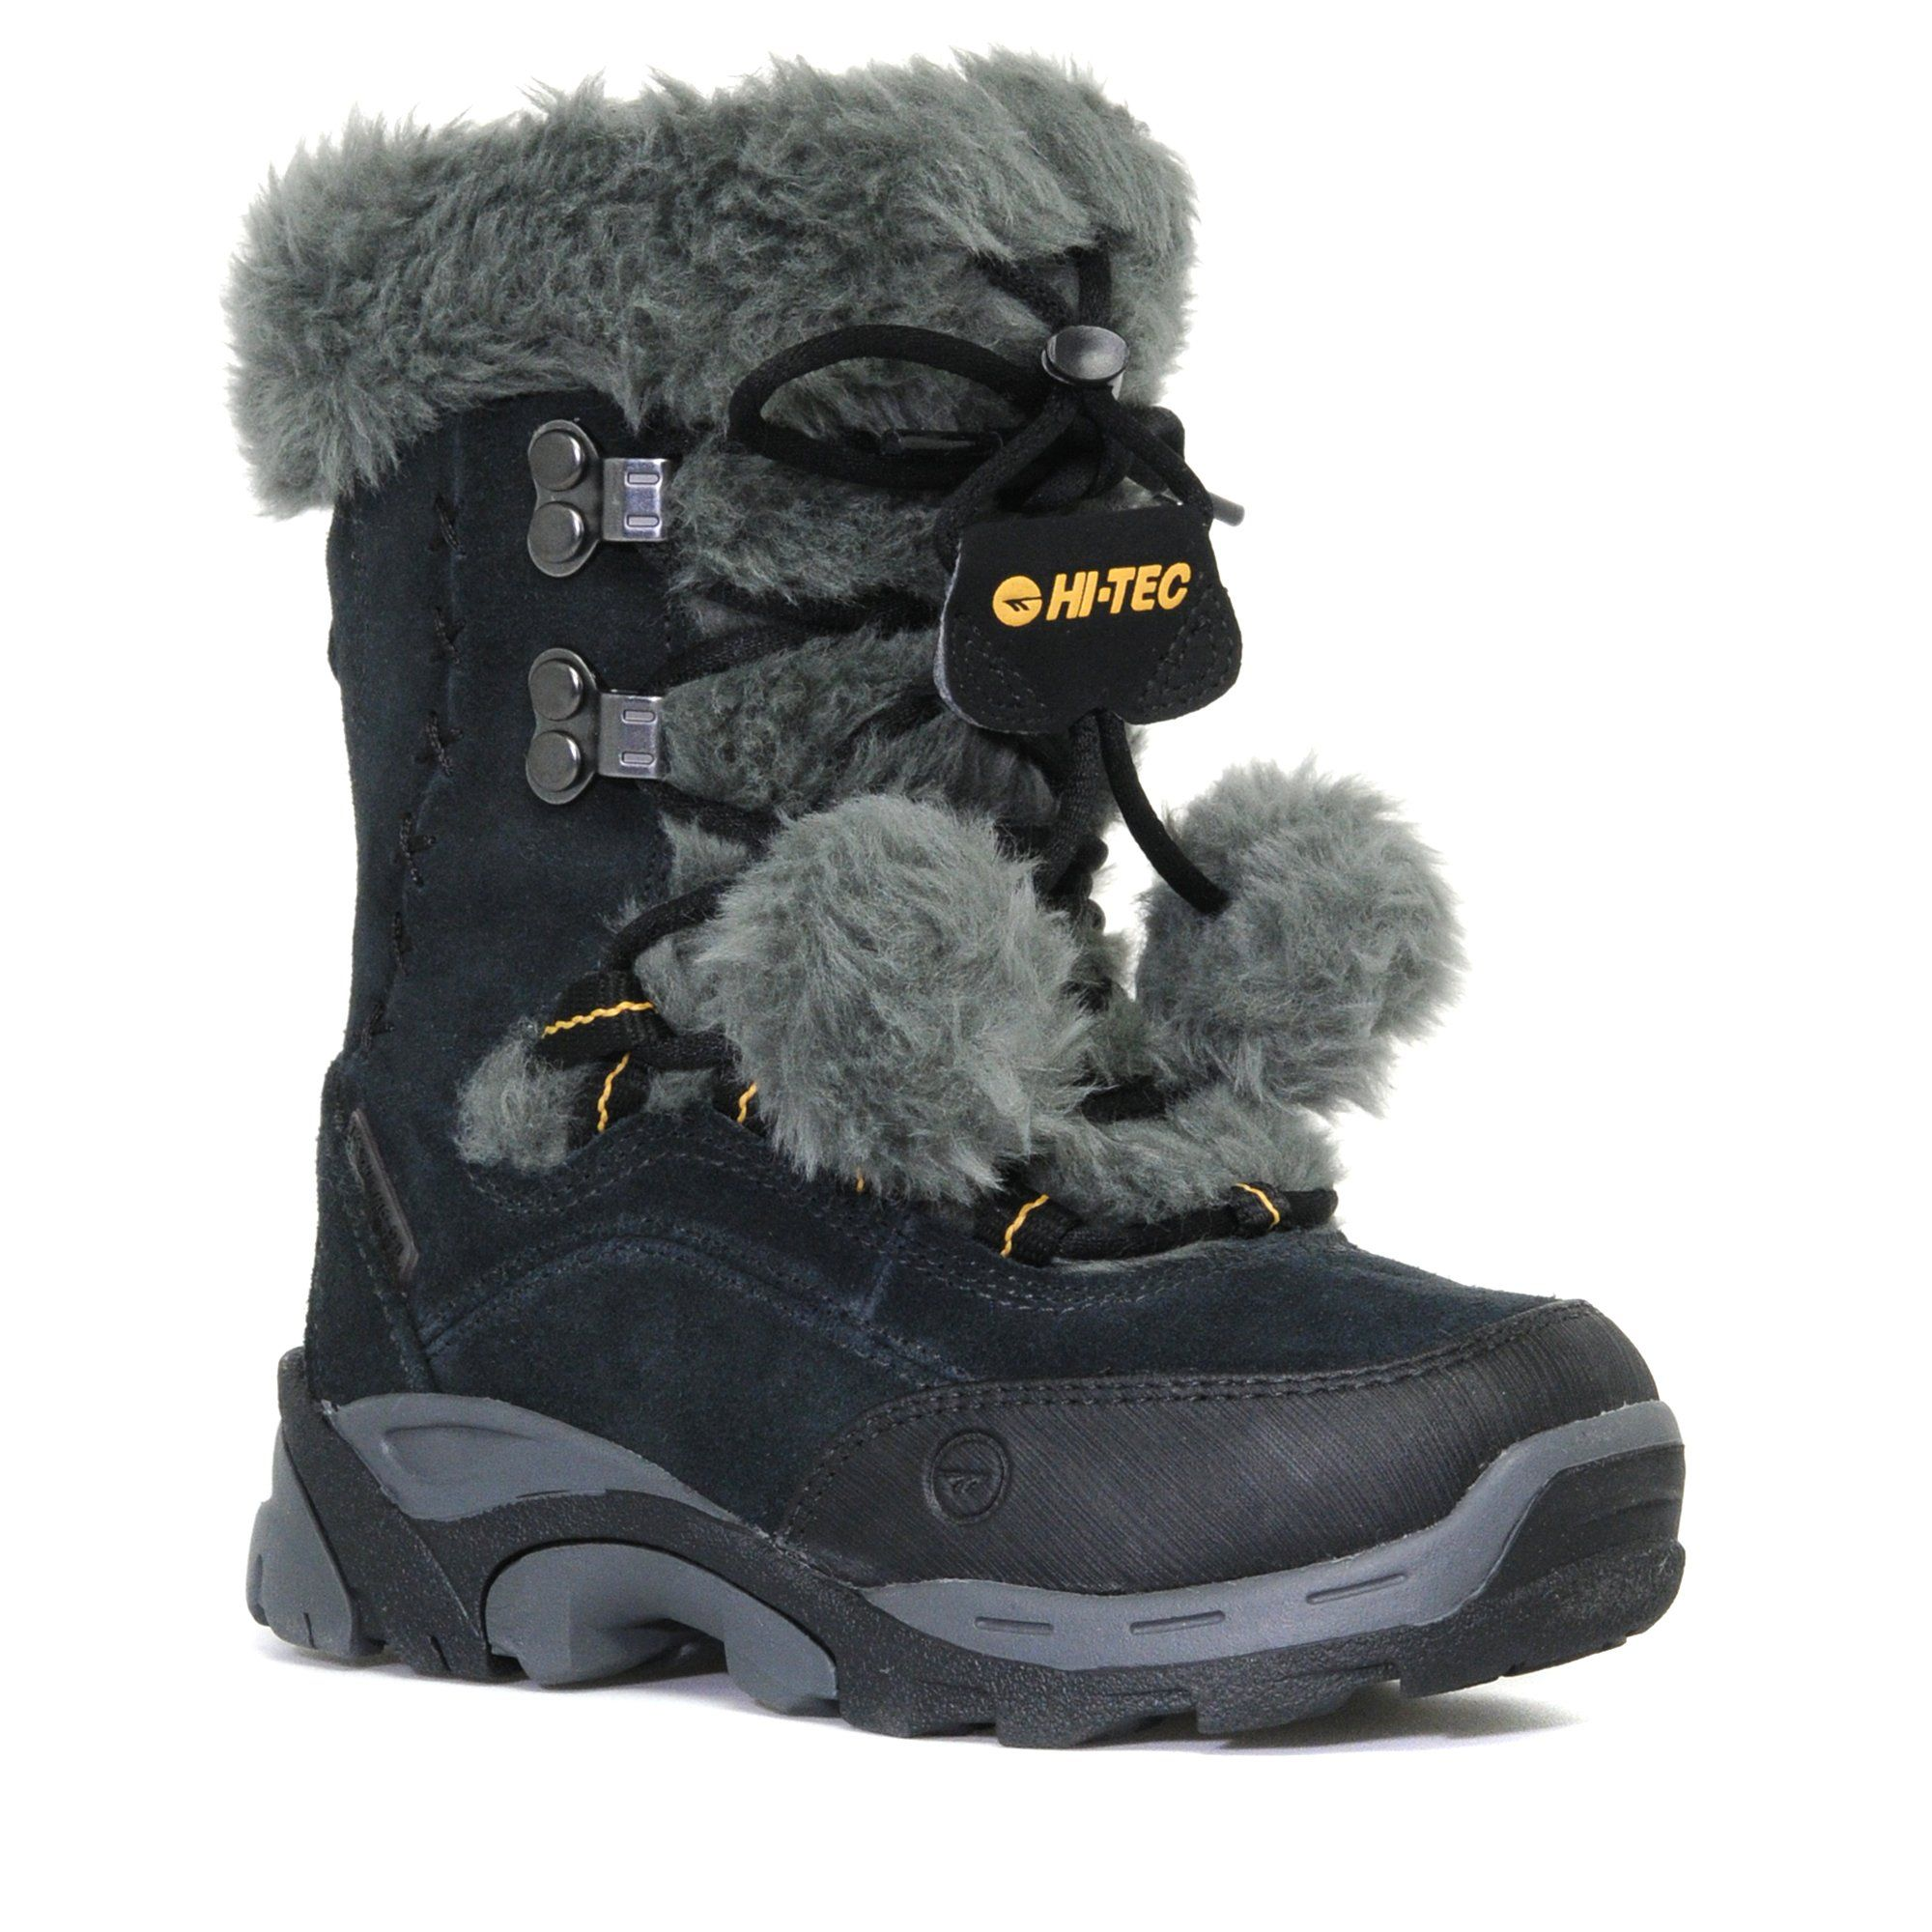 HI TEC Girls' St Moritz Snow Boot